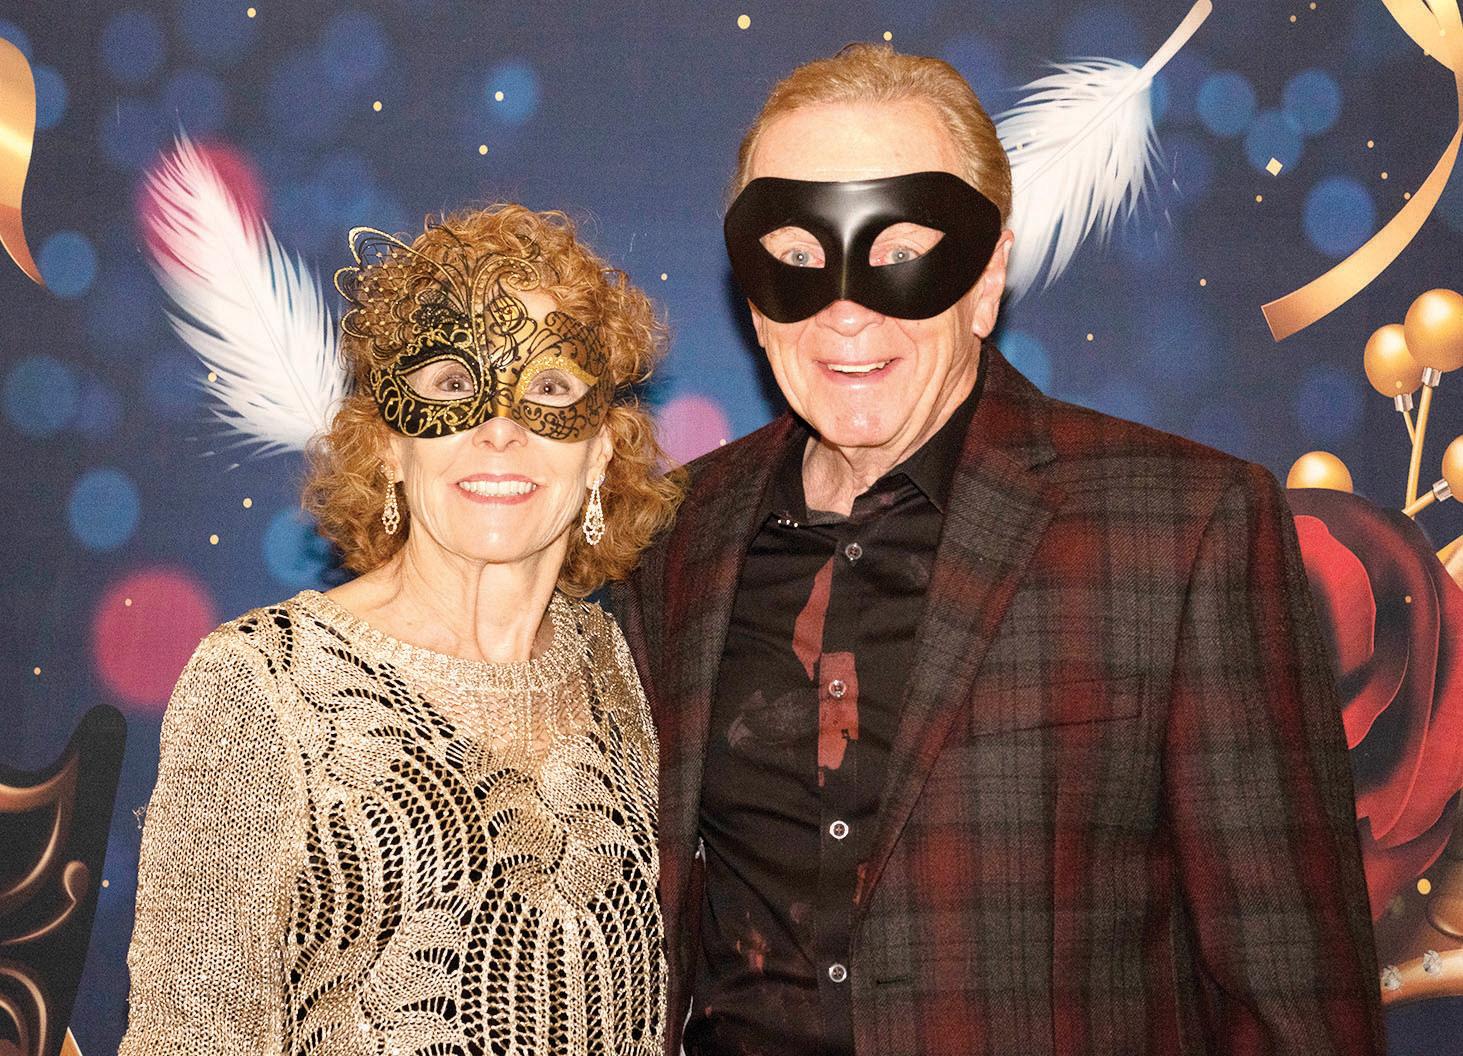 Bob Osborne and Wanda Ross at last year's Masquerade Ball (Photo by Sheila Honey)